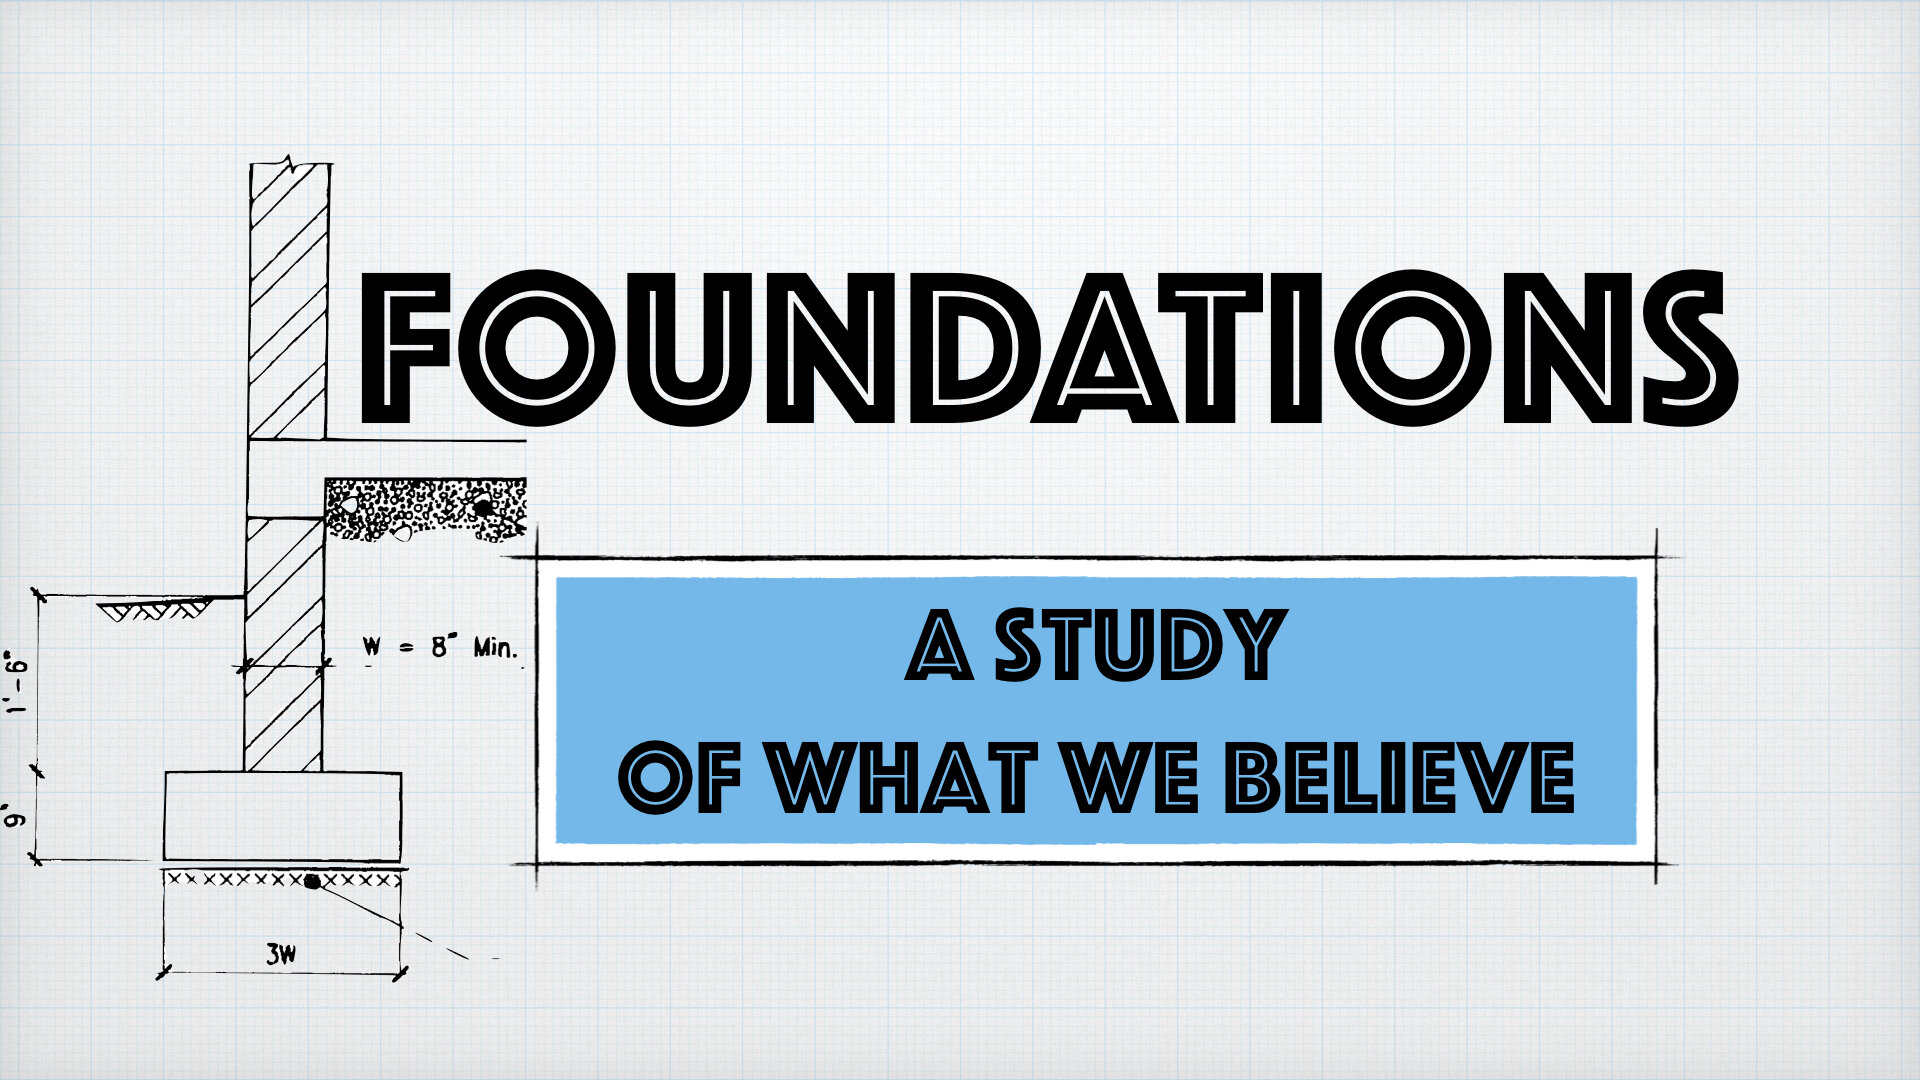 FoundationsGraphic.001.jpeg